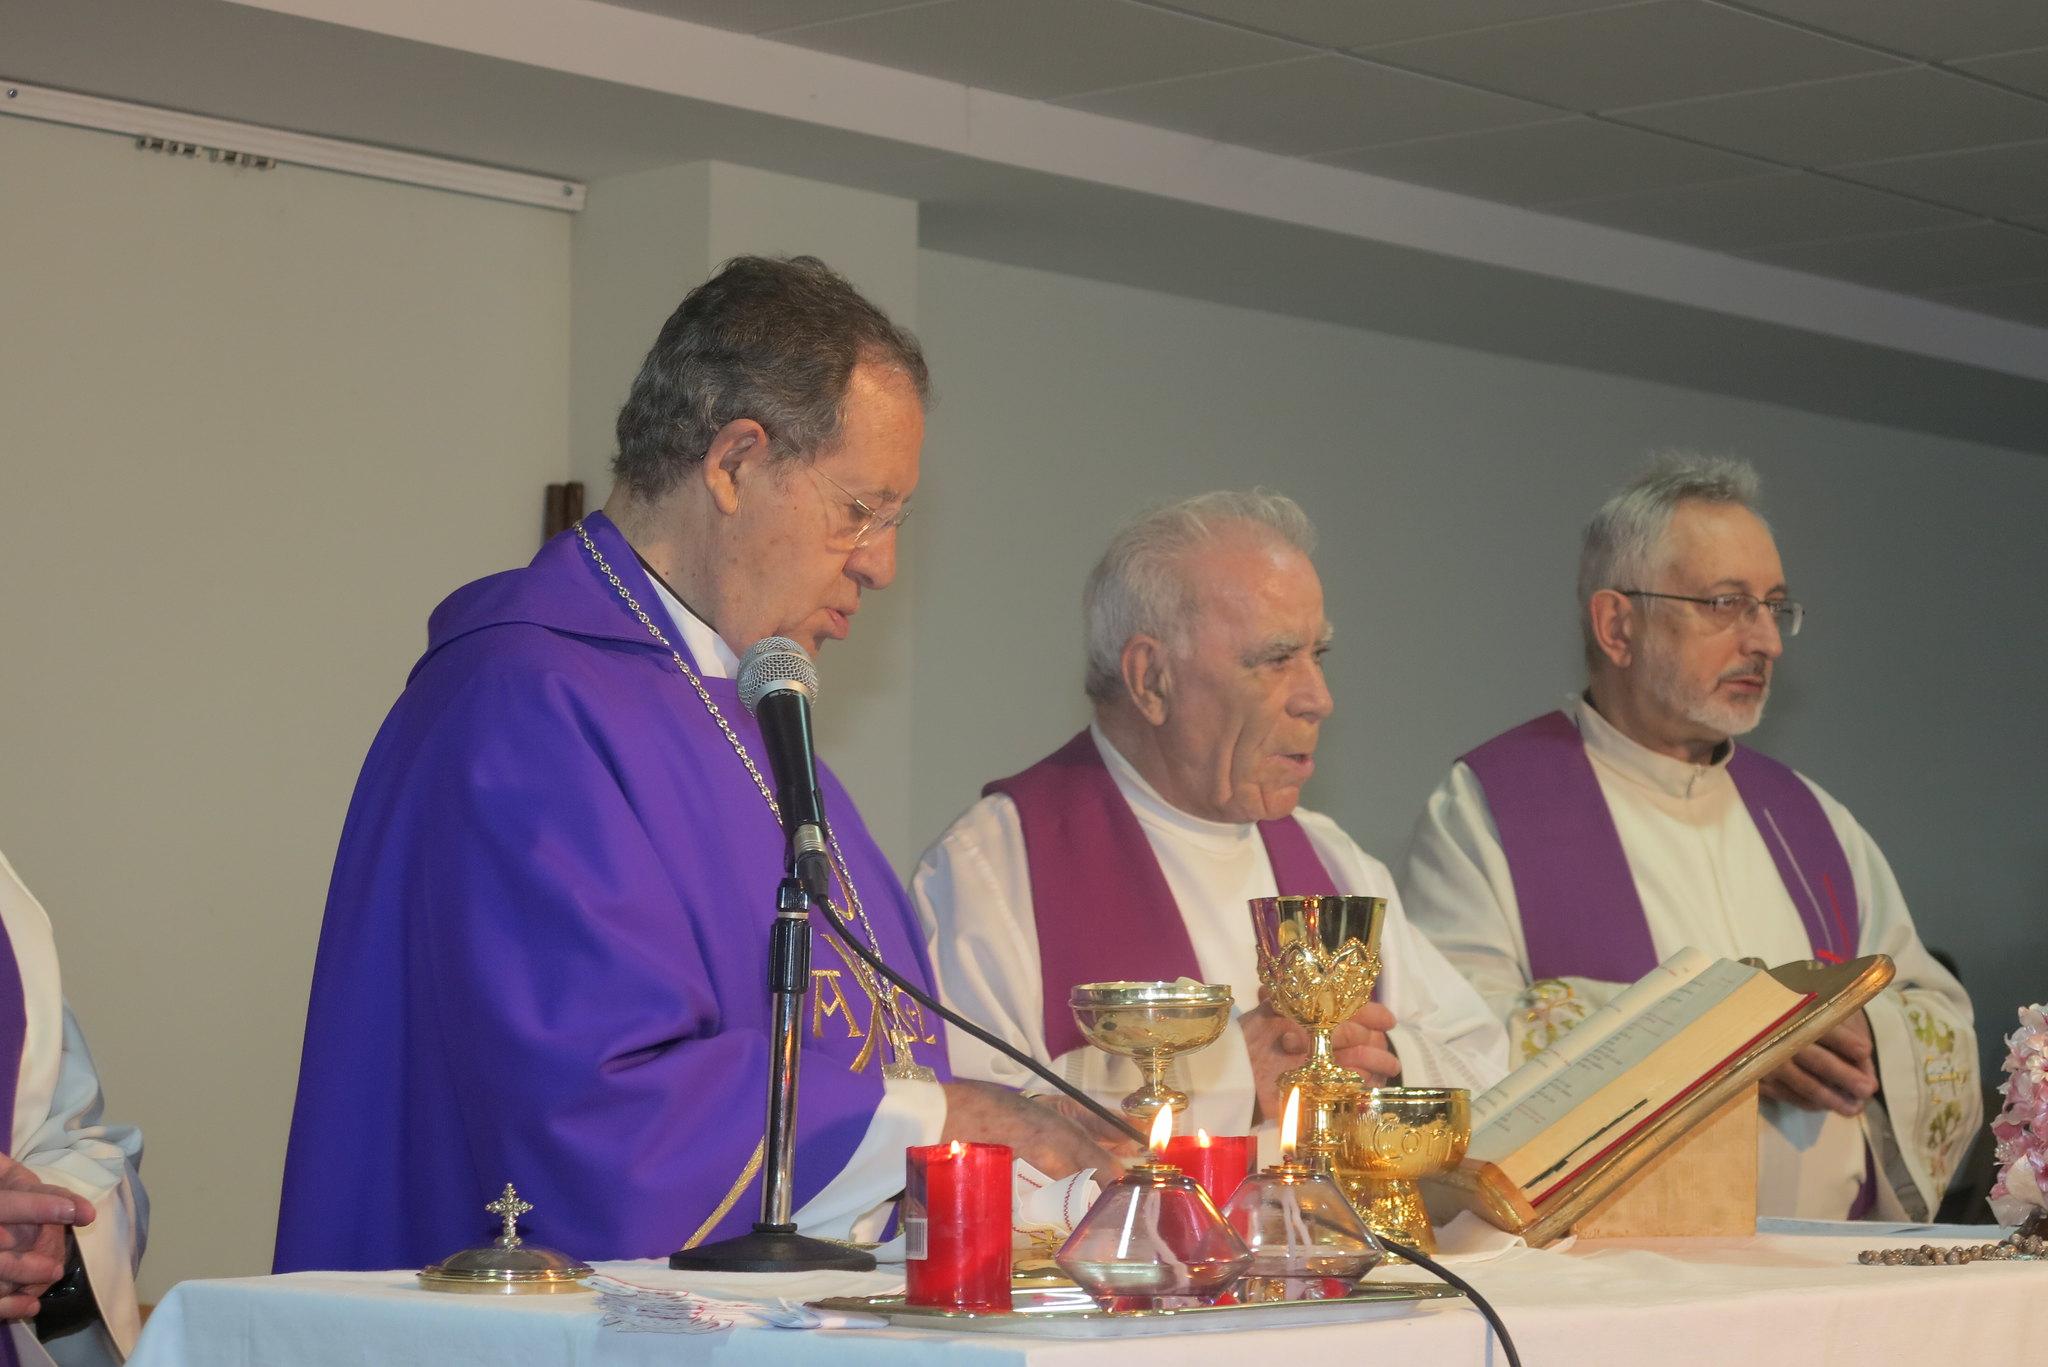 (2016-02-13) - Inauguración Virgen de Lourdes, La Molineta - Archivo La Molineta 2 (34)